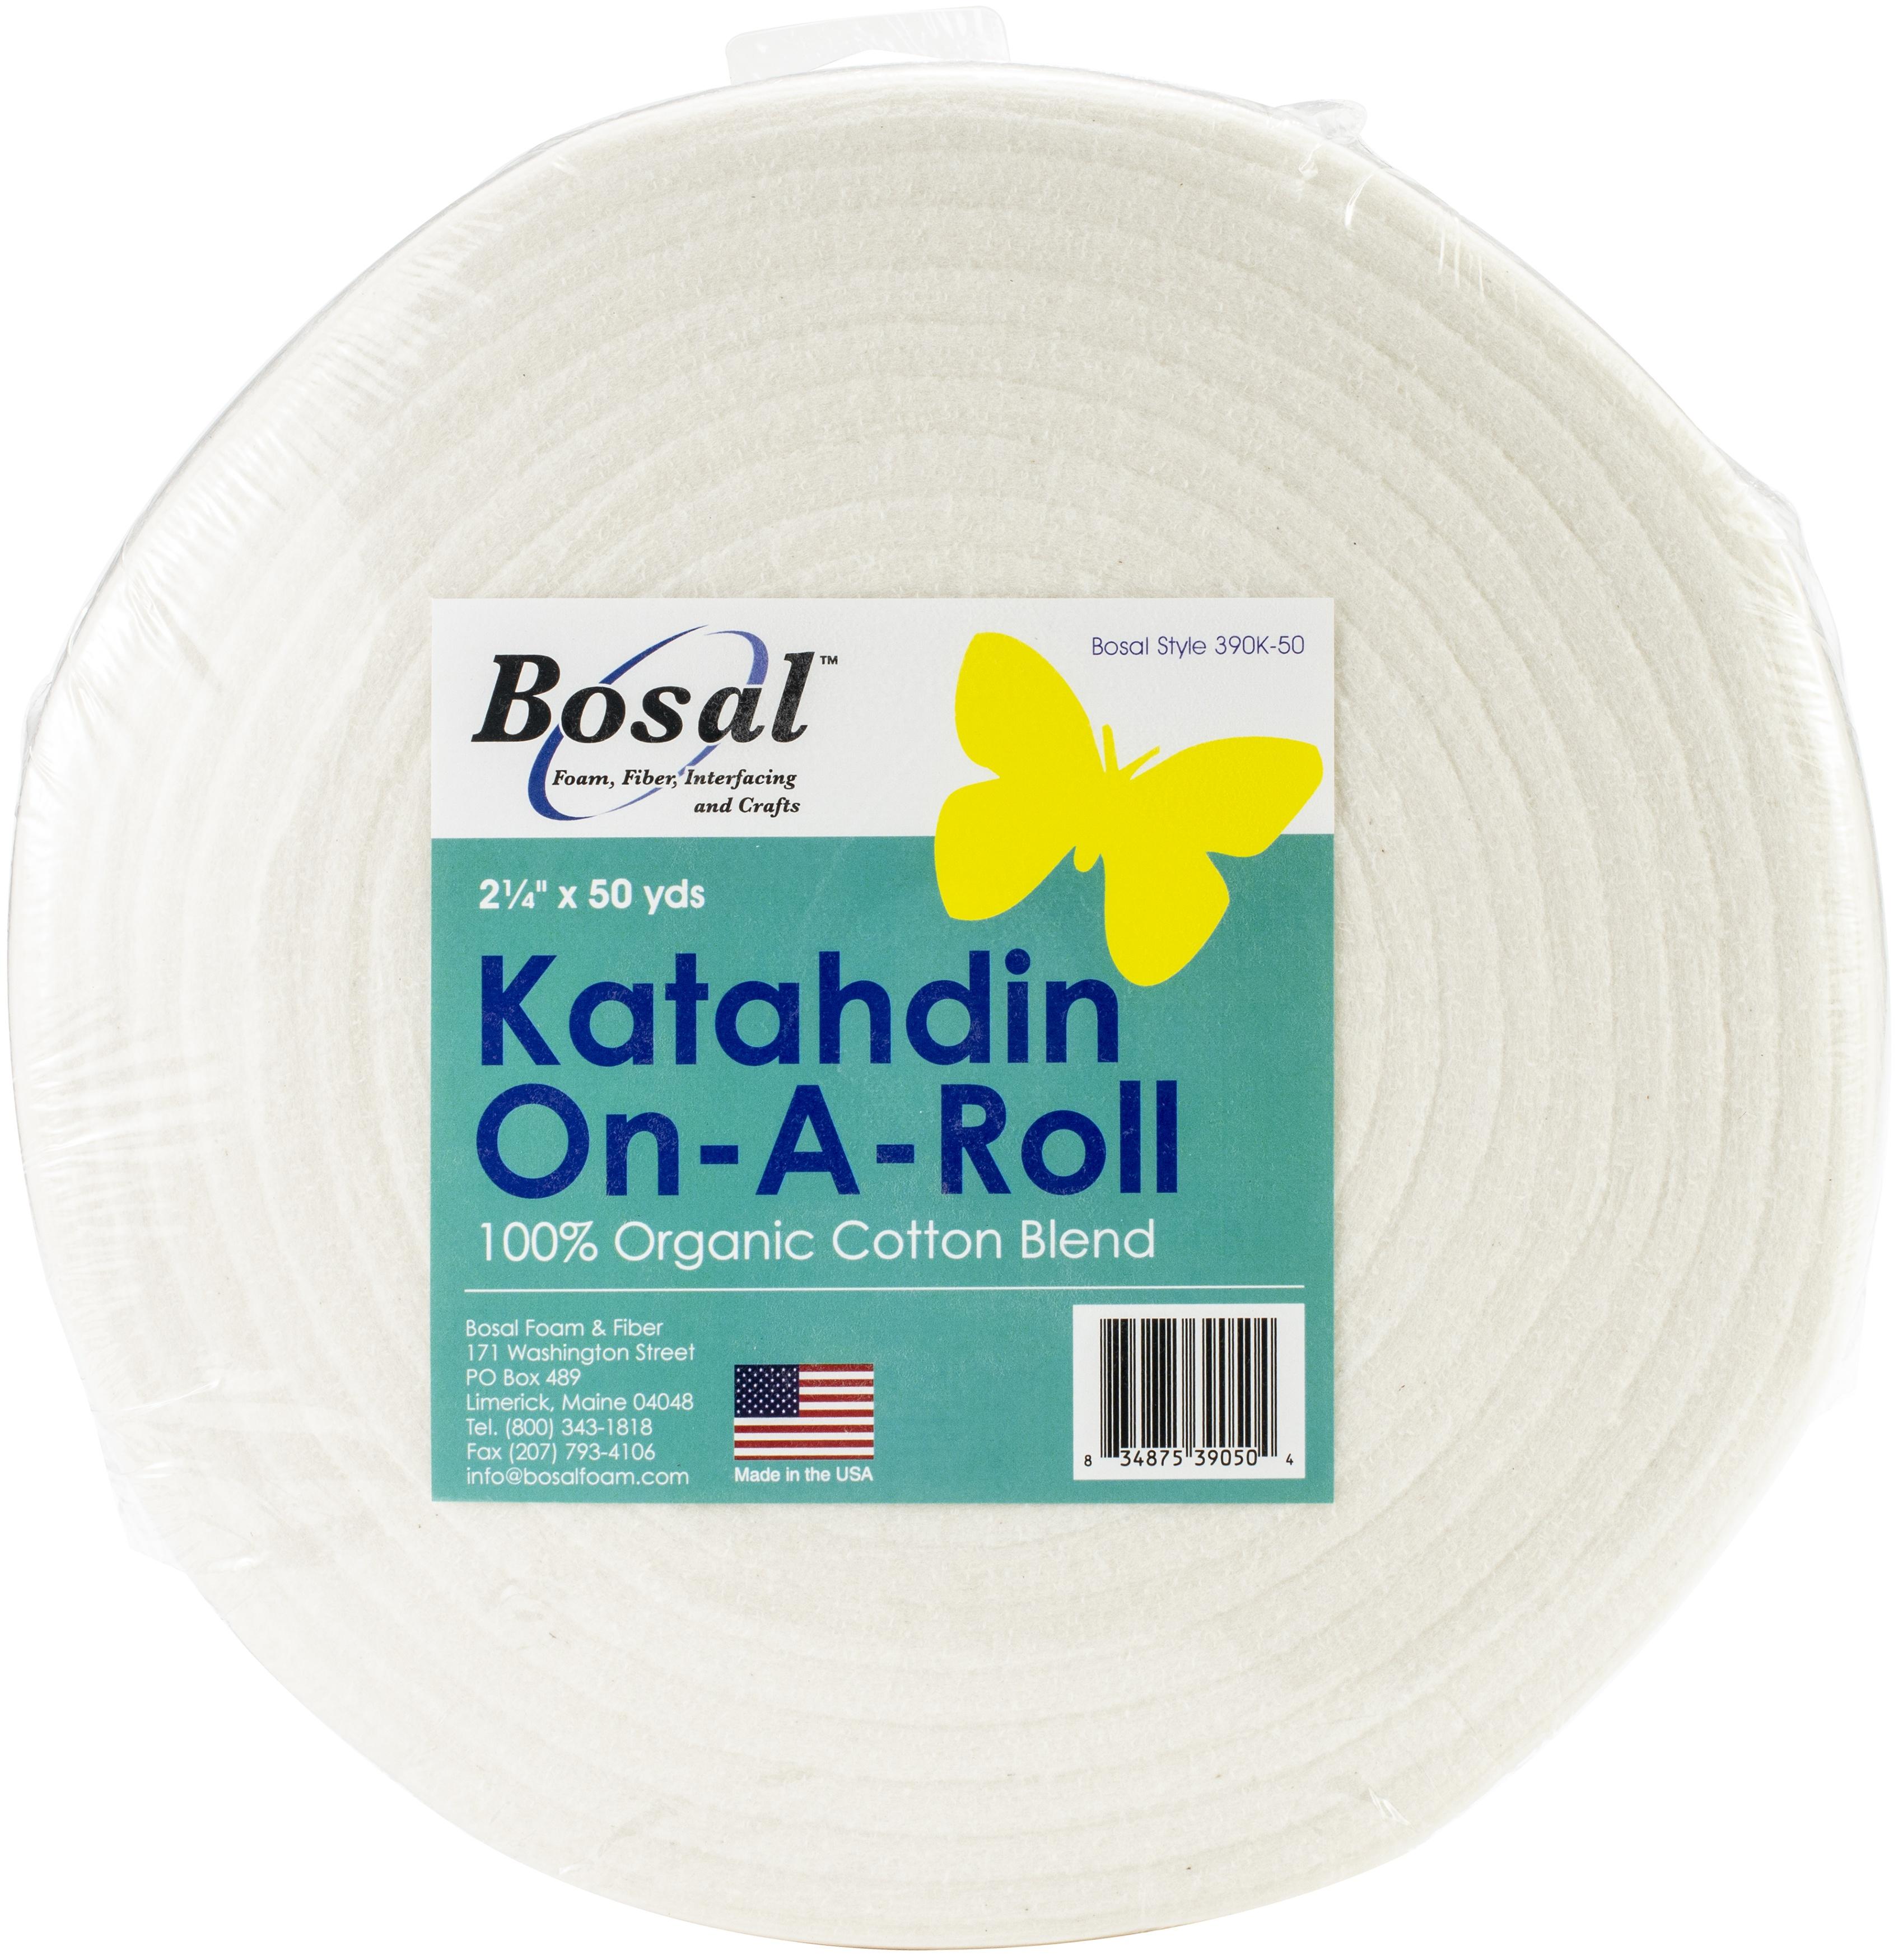 Bosal Katahdin On-A-Roll 100% Organic Cotton Batting-2.25X50yd